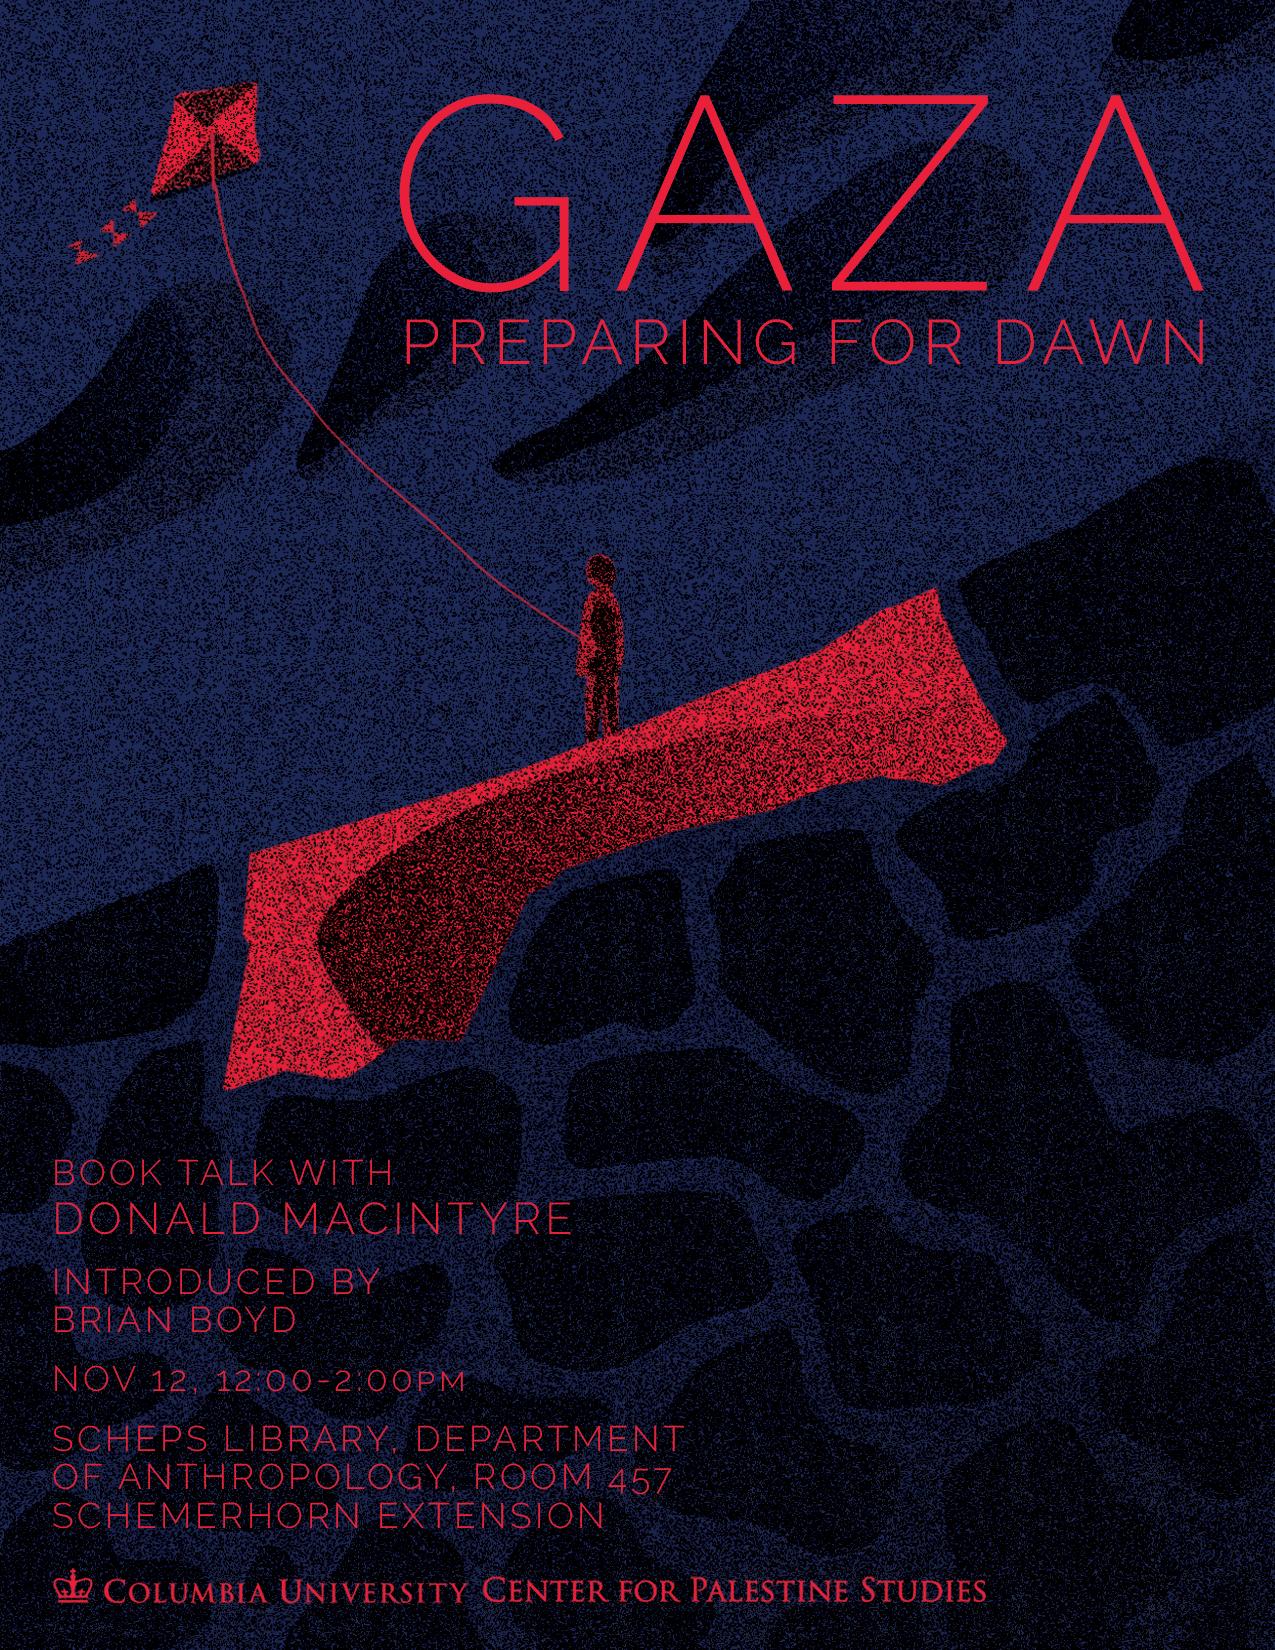 GAZA, Preparing for the Dawn